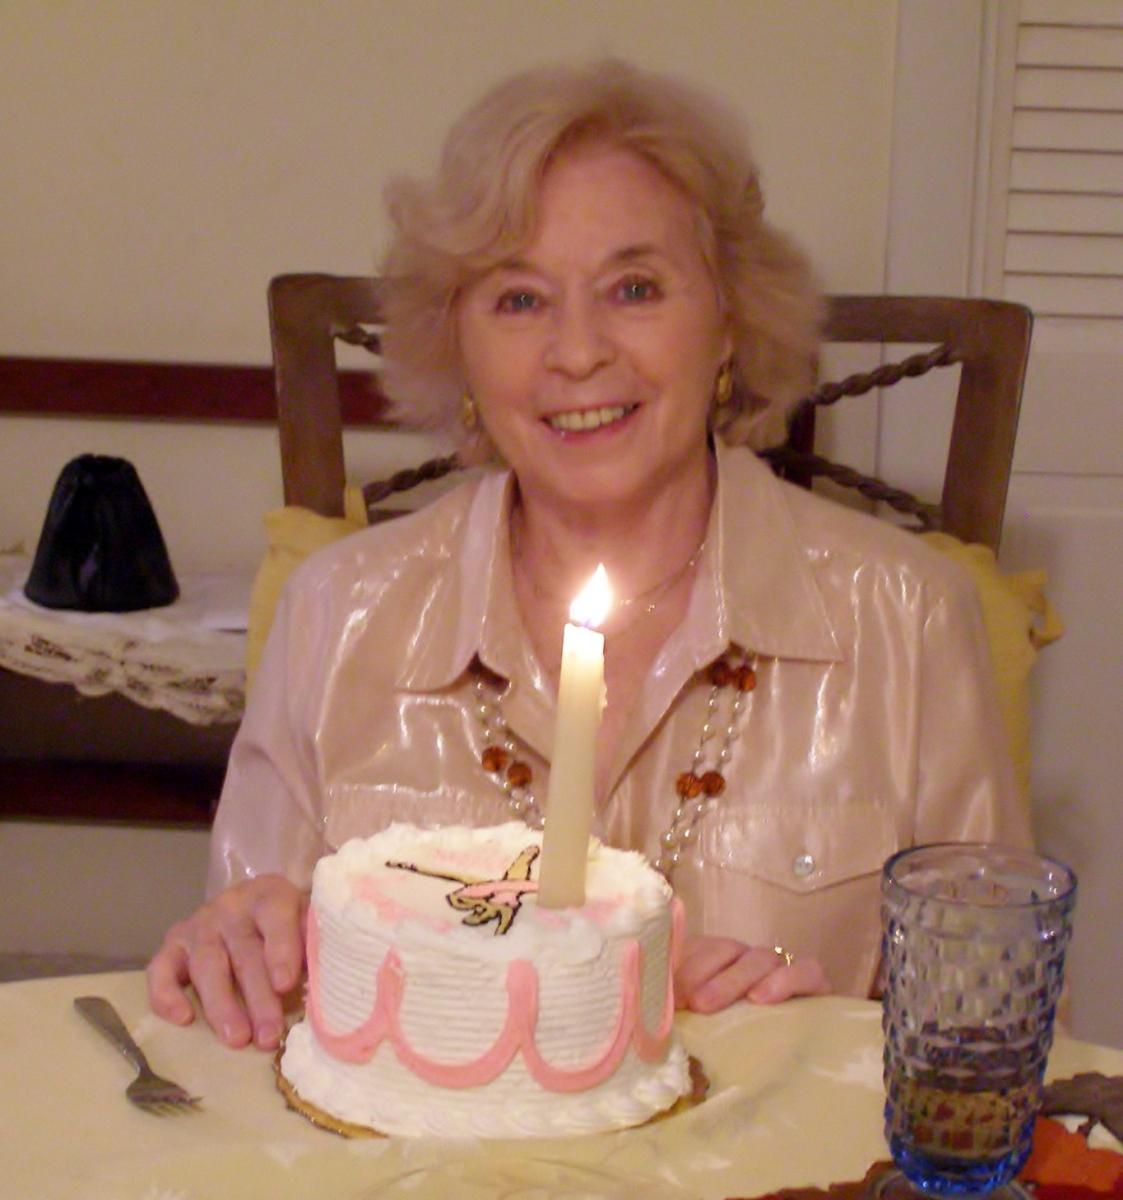 Rita with Birthday cake, October 2012